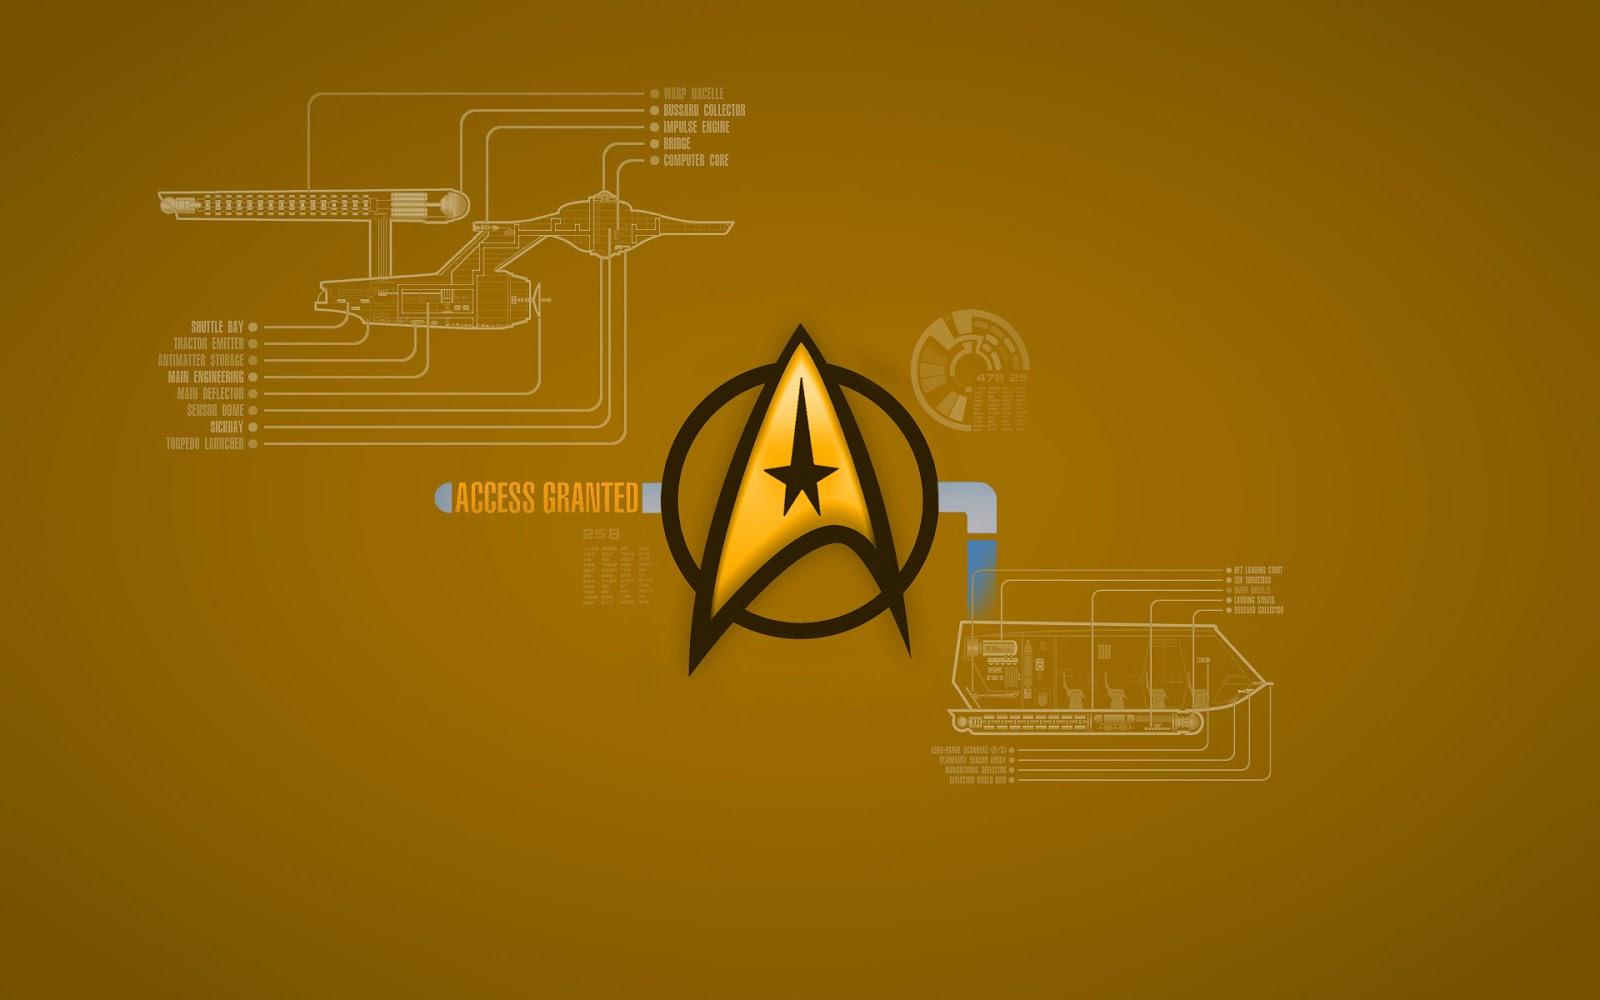 50 Hd Star Trek Wallpapers For Desktop 2020 We 7